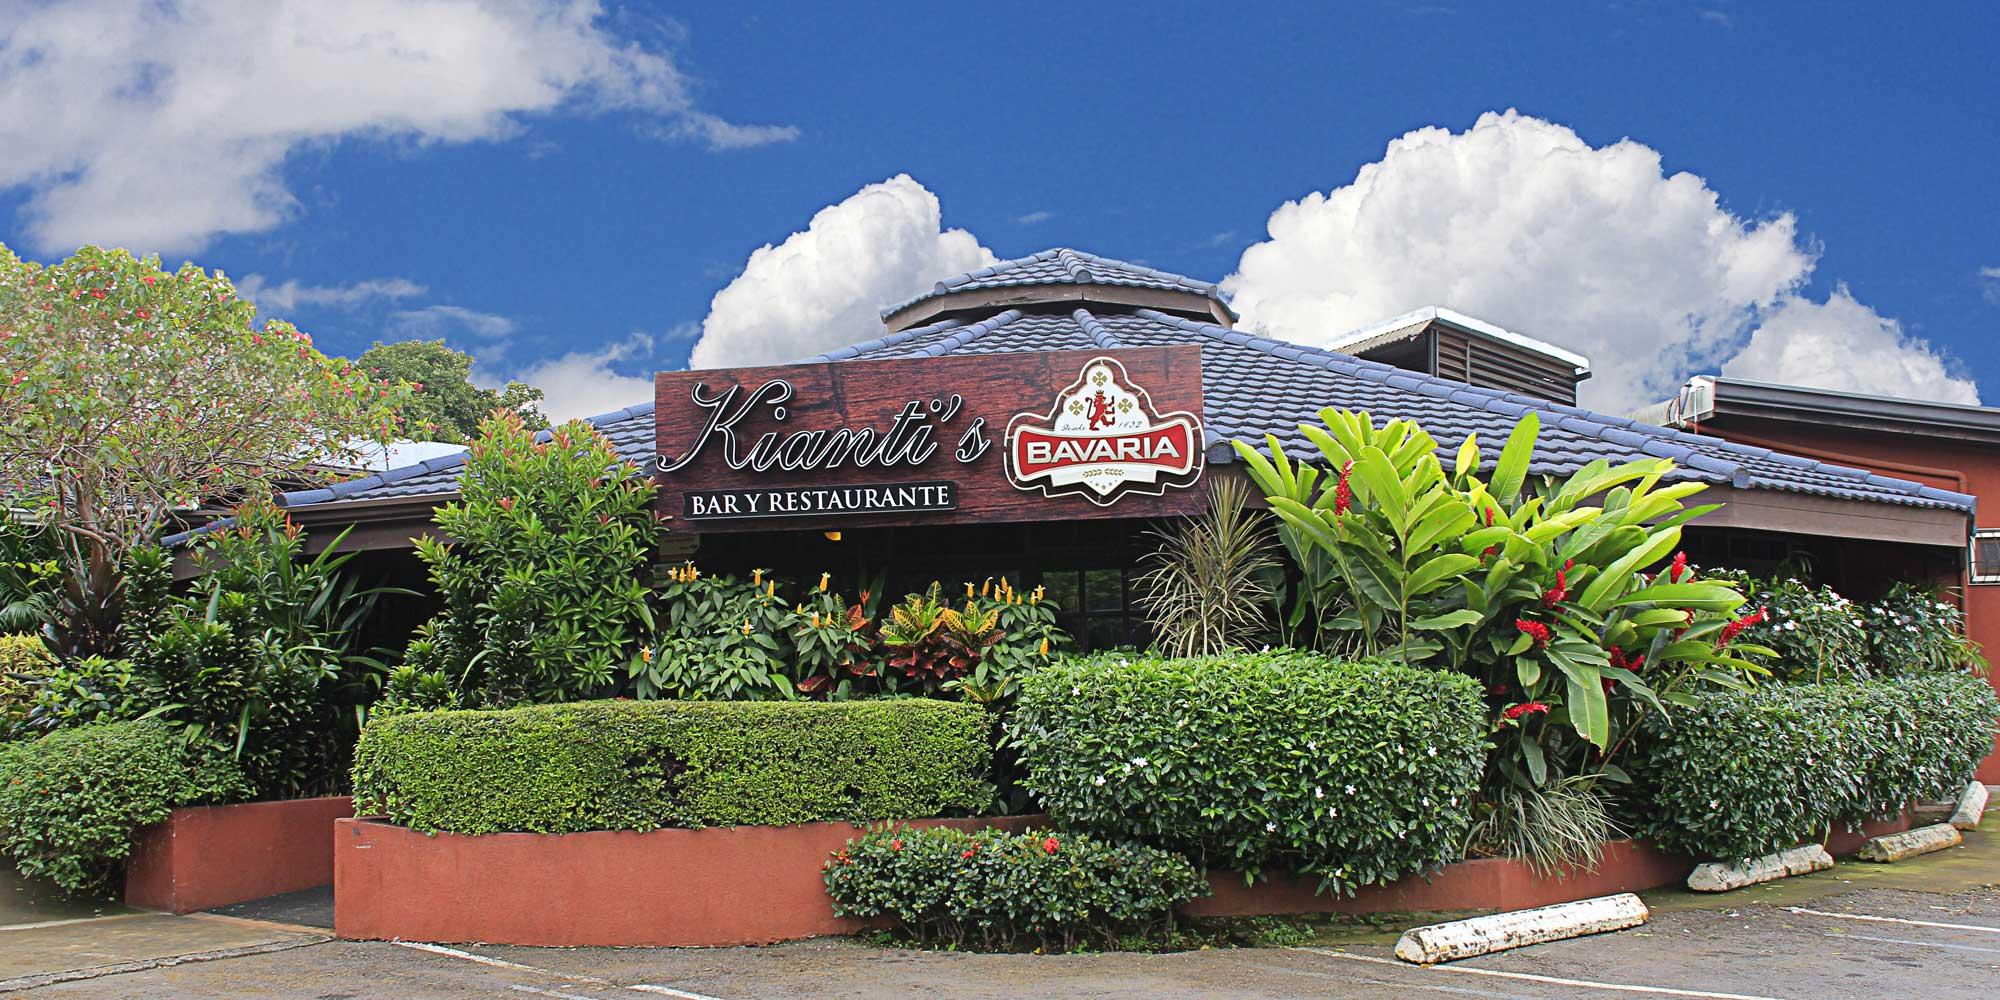 Kiantis Restaurante en La Rivera de Belén, Heredia, Costa Rica